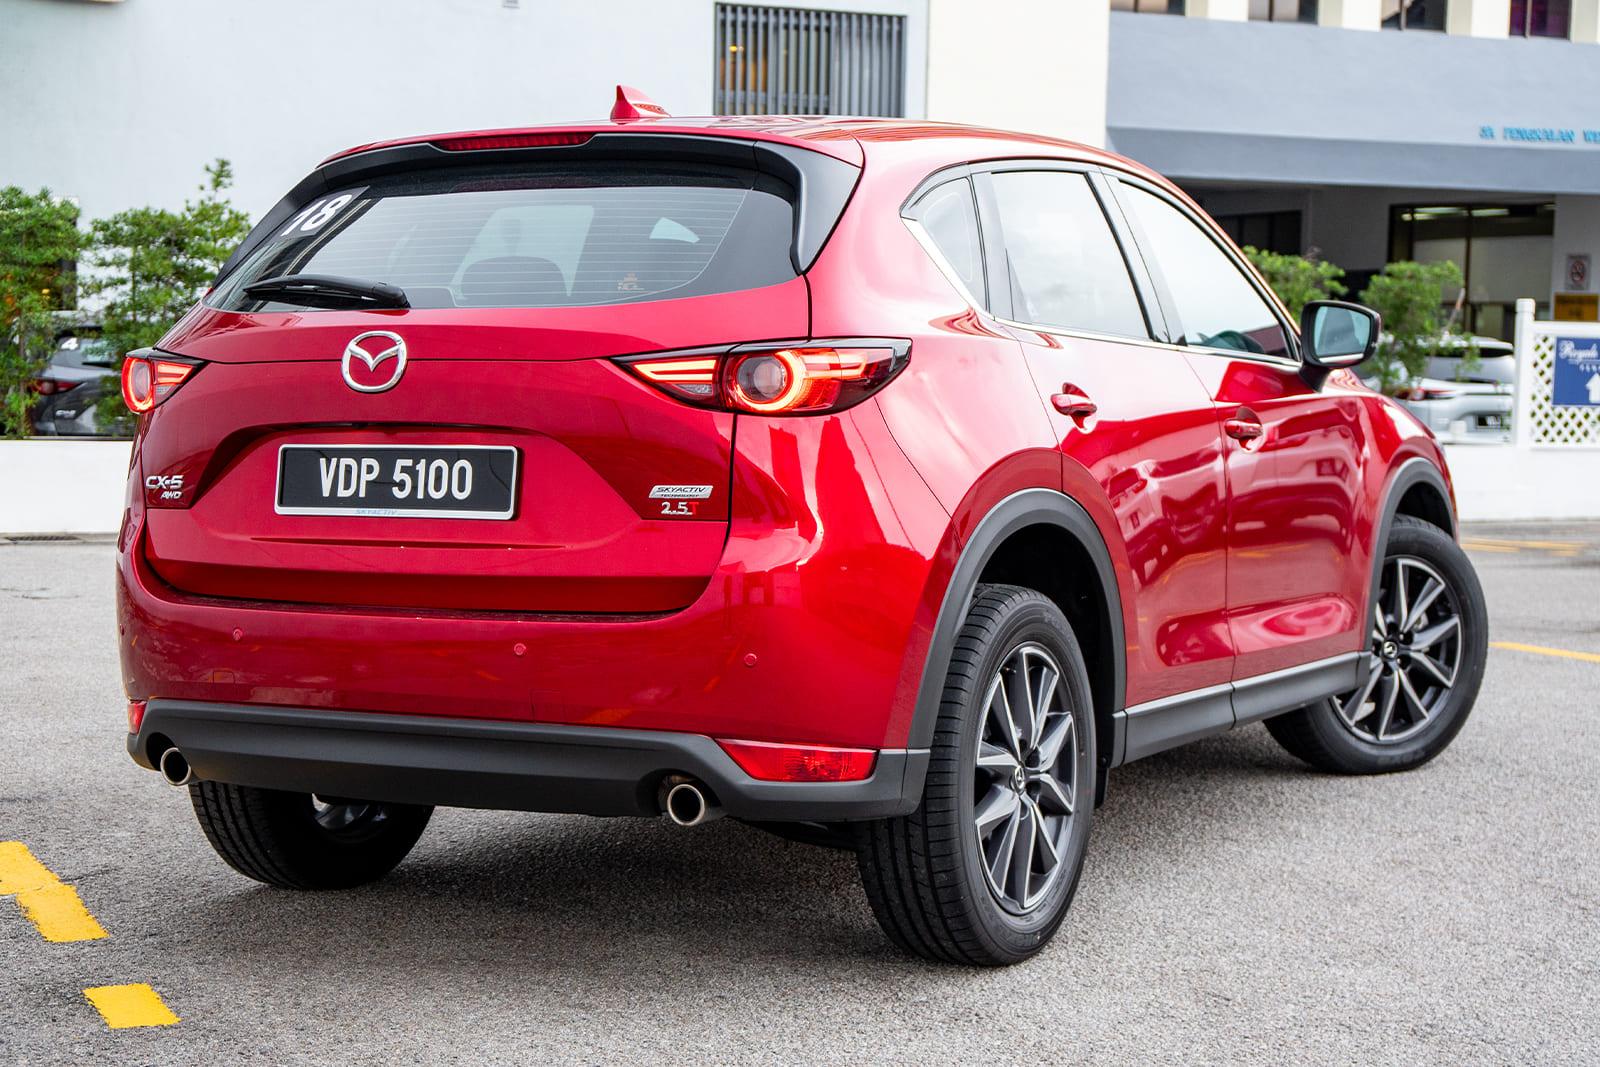 2019 Mazda CX-5 2.5 Turbo WapCar Ratings results, 166.5/250 score, superb performance